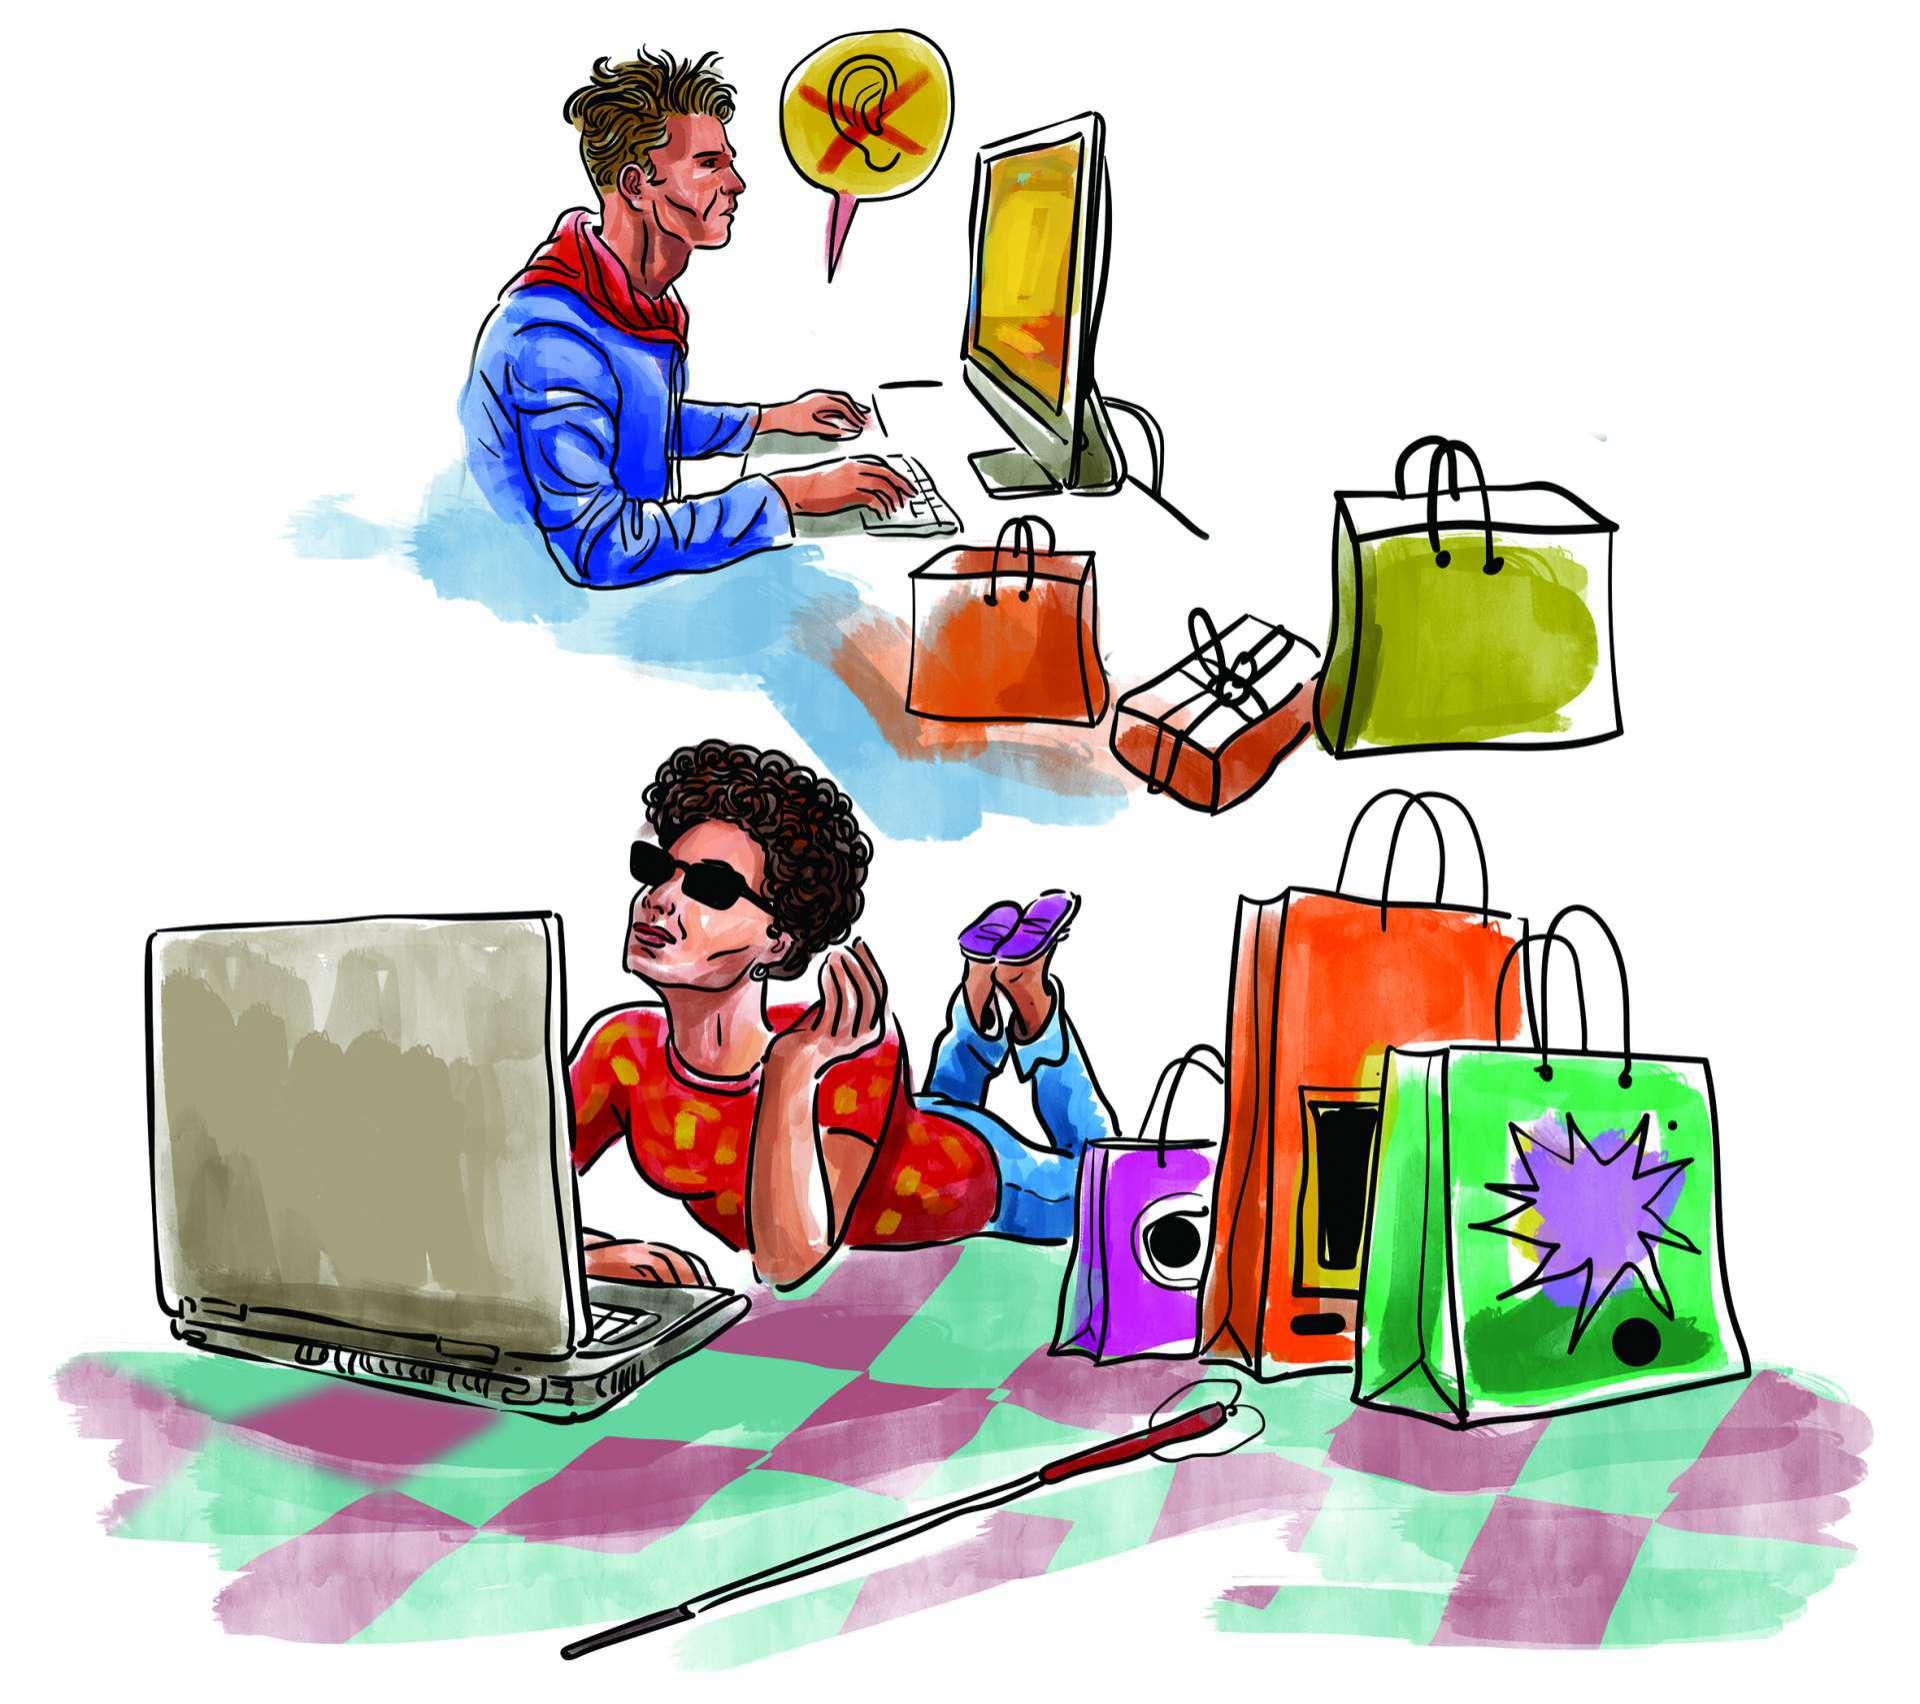 Acessibilidade dos sites aos deficientes